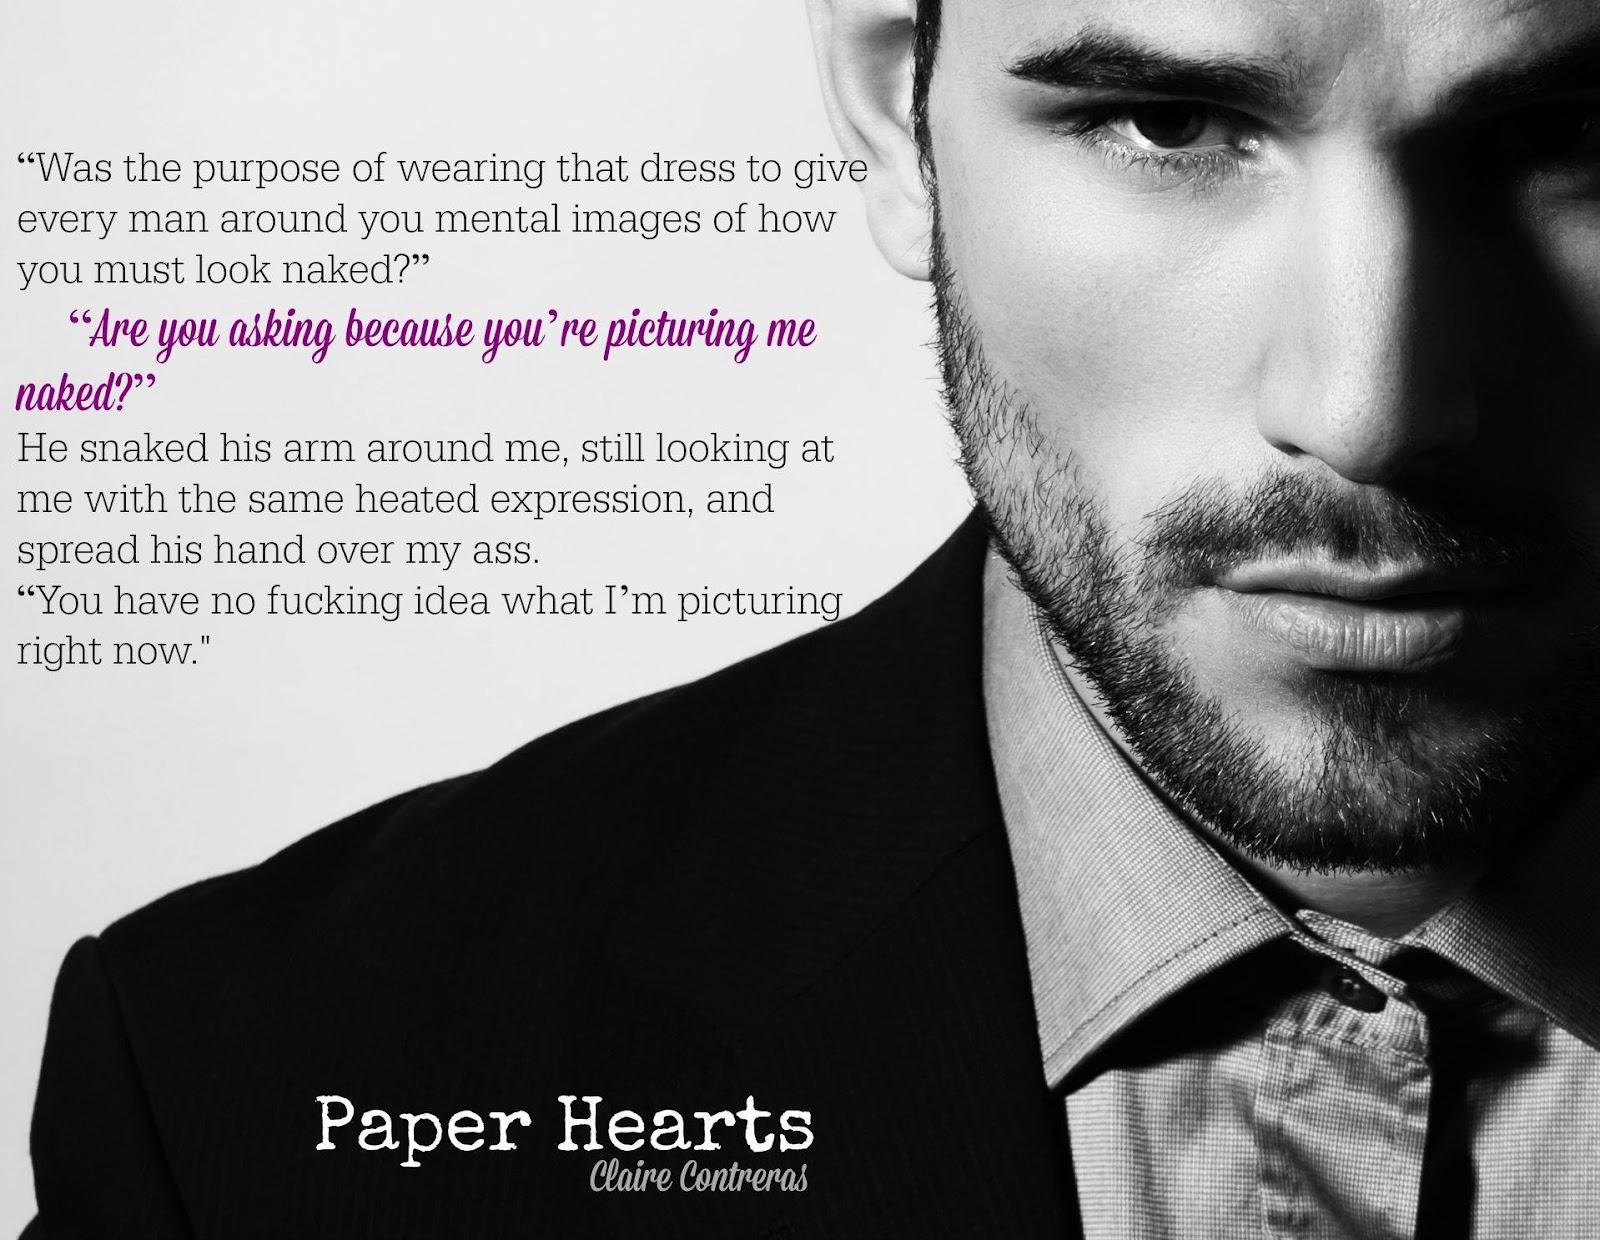 paper hearts teaser 5.jpg